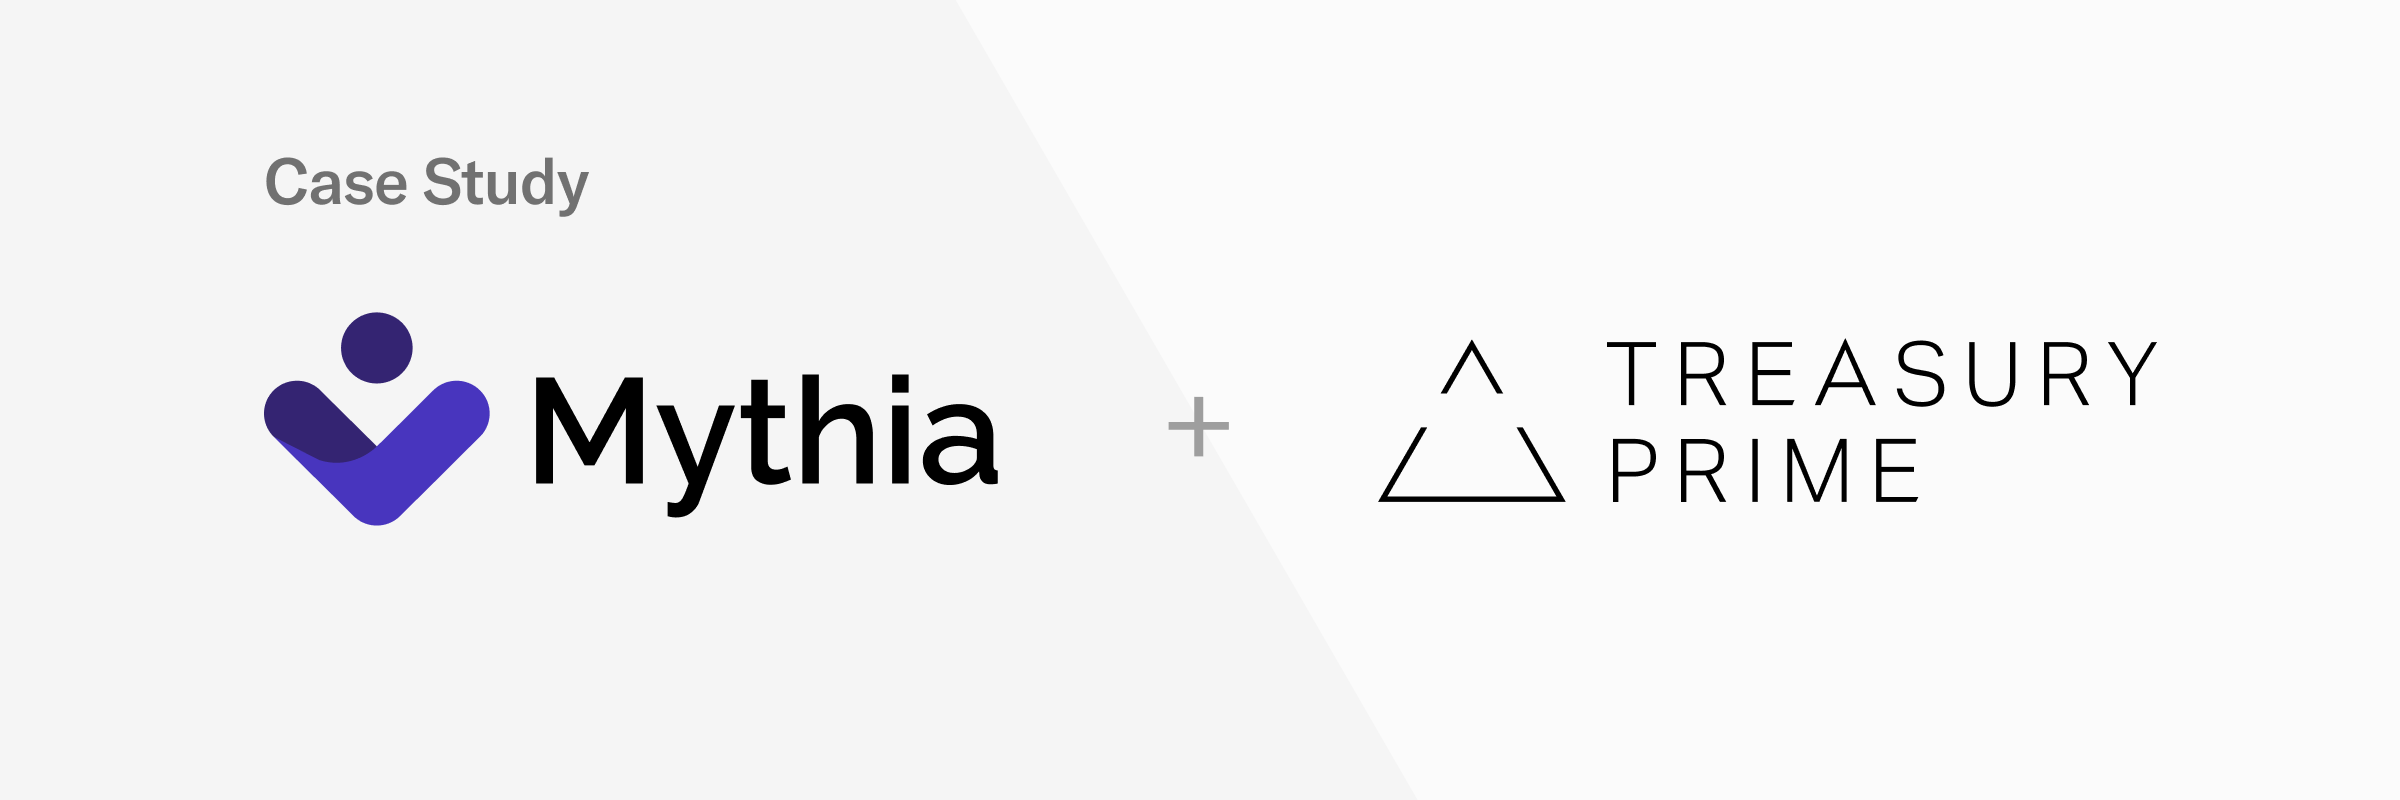 Case Study: Mythia + Treasury Prime